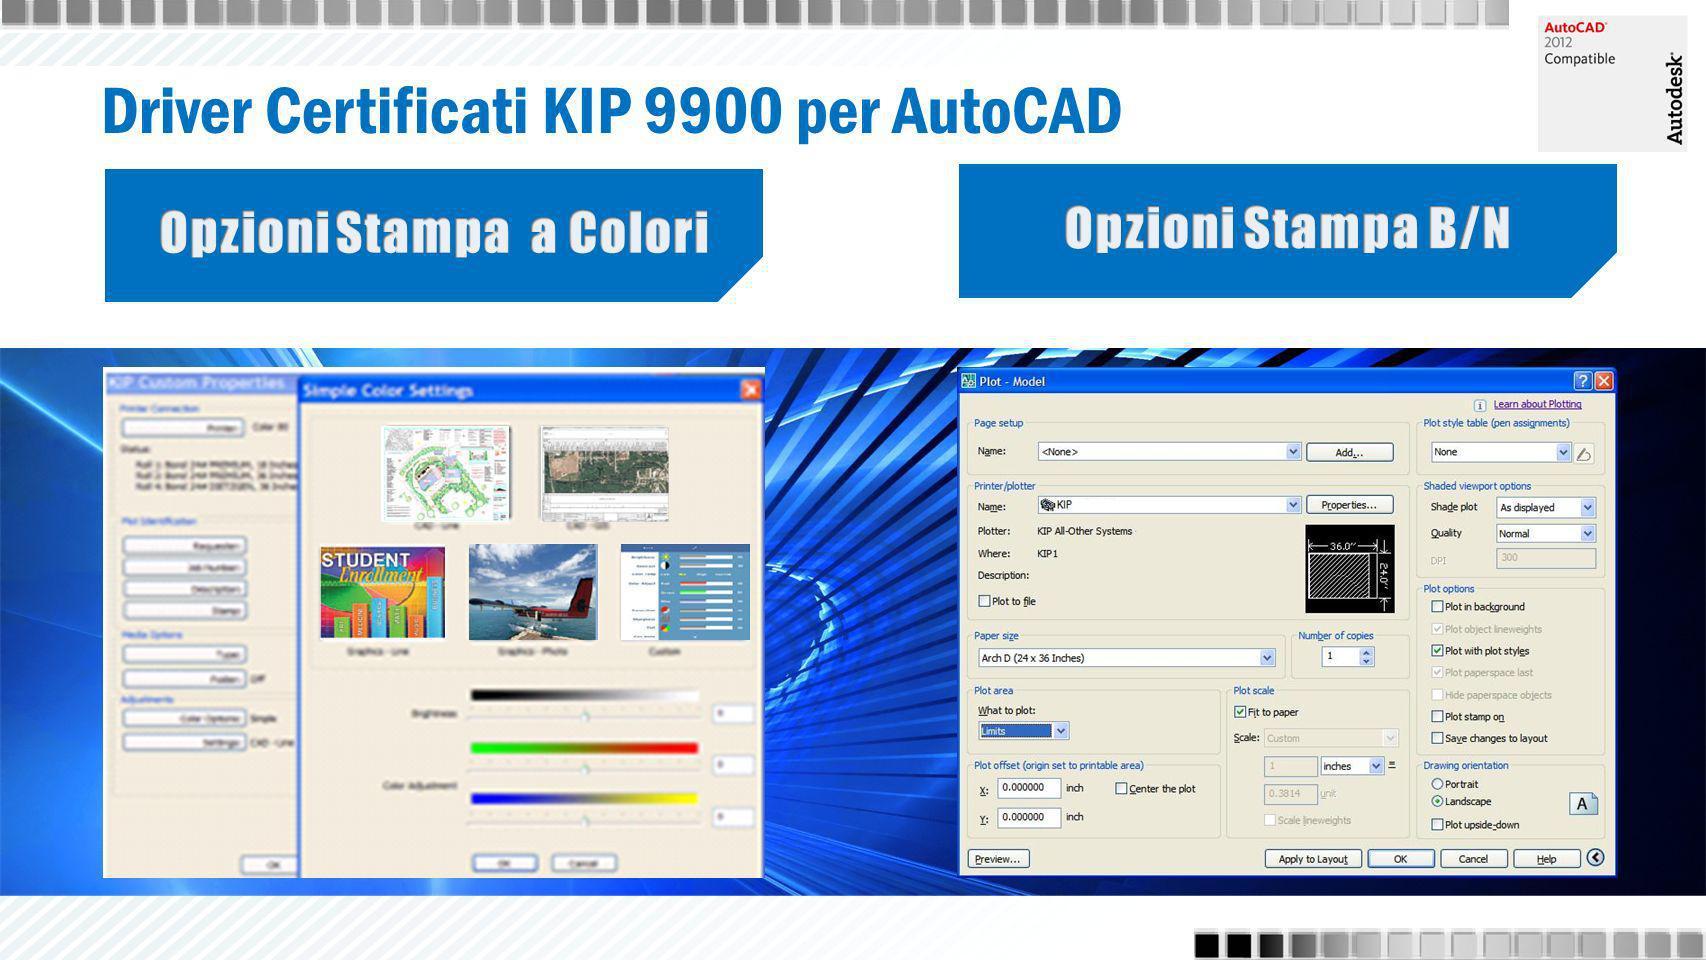 Driver Certificati KIP 9900 per AutoCAD